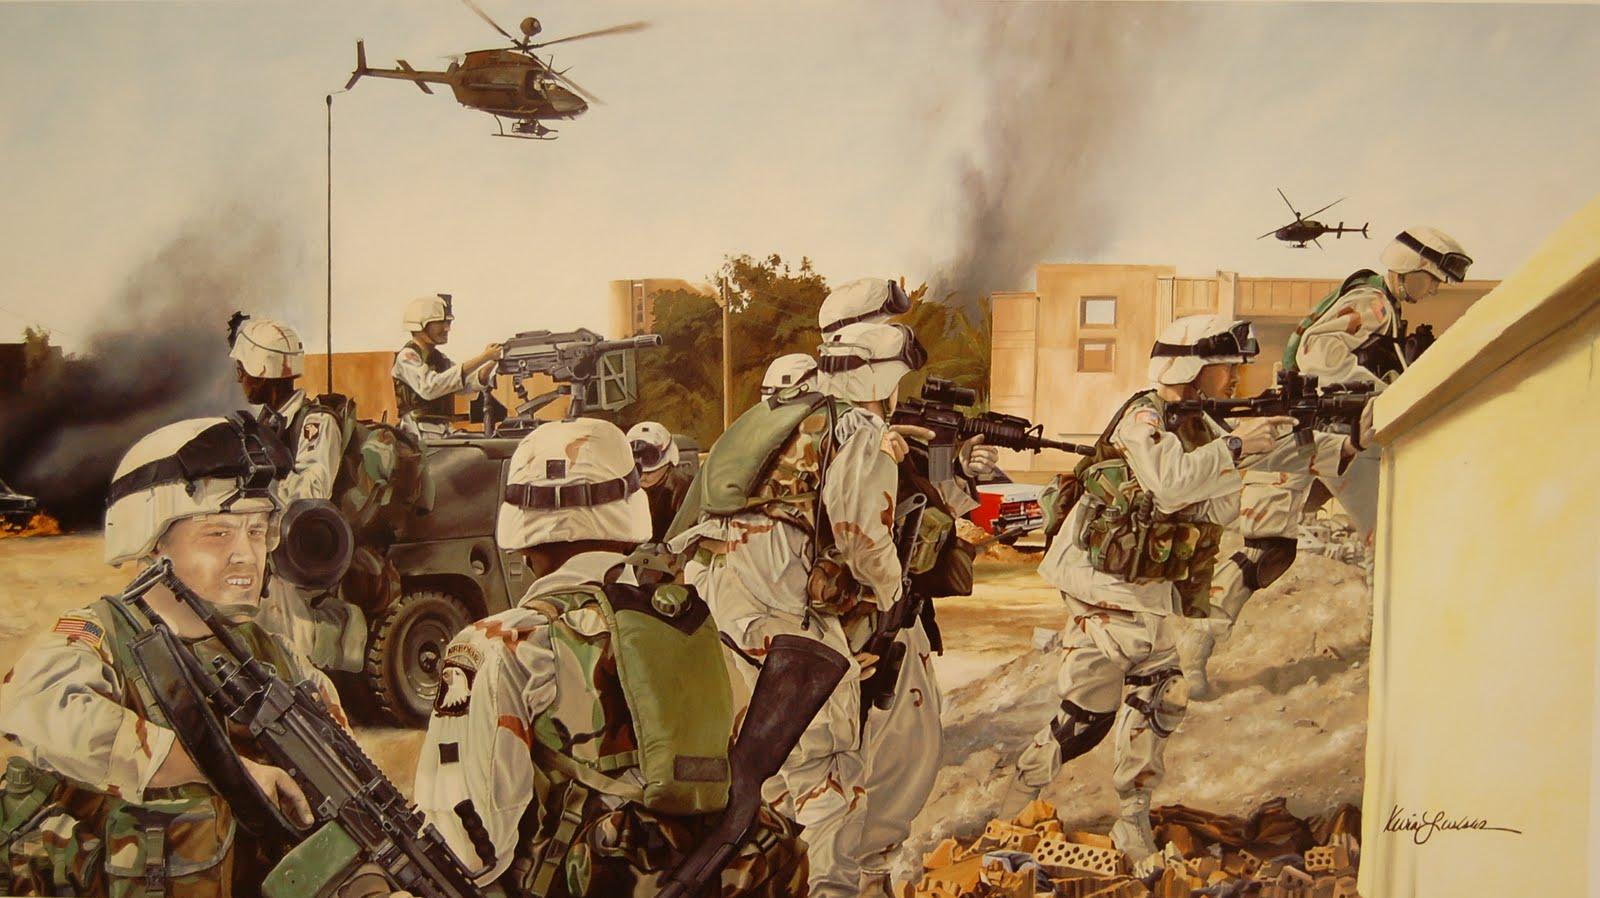 http://3.bp.blogspot.com/_BAFAgnw2sJI/TKuoZphbiOI/AAAAAAAAAMw/6WGRVaAJb_s/s1600/Operation+Iraqi+Freedom.JPG